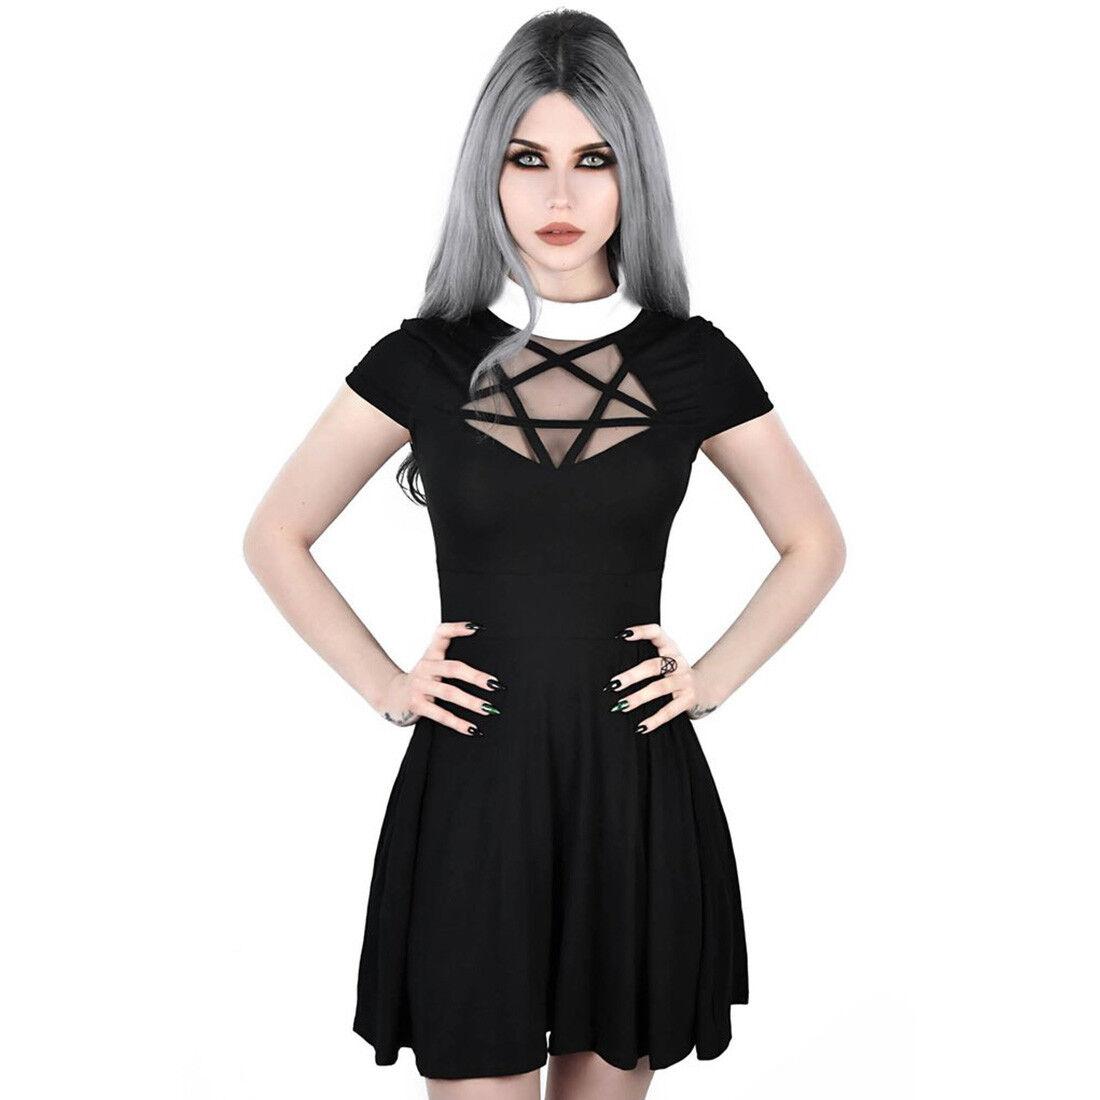 Killstar Gothic Goth Okkult Minikleid Skater Kleid - Hades Pentagramm Spitze